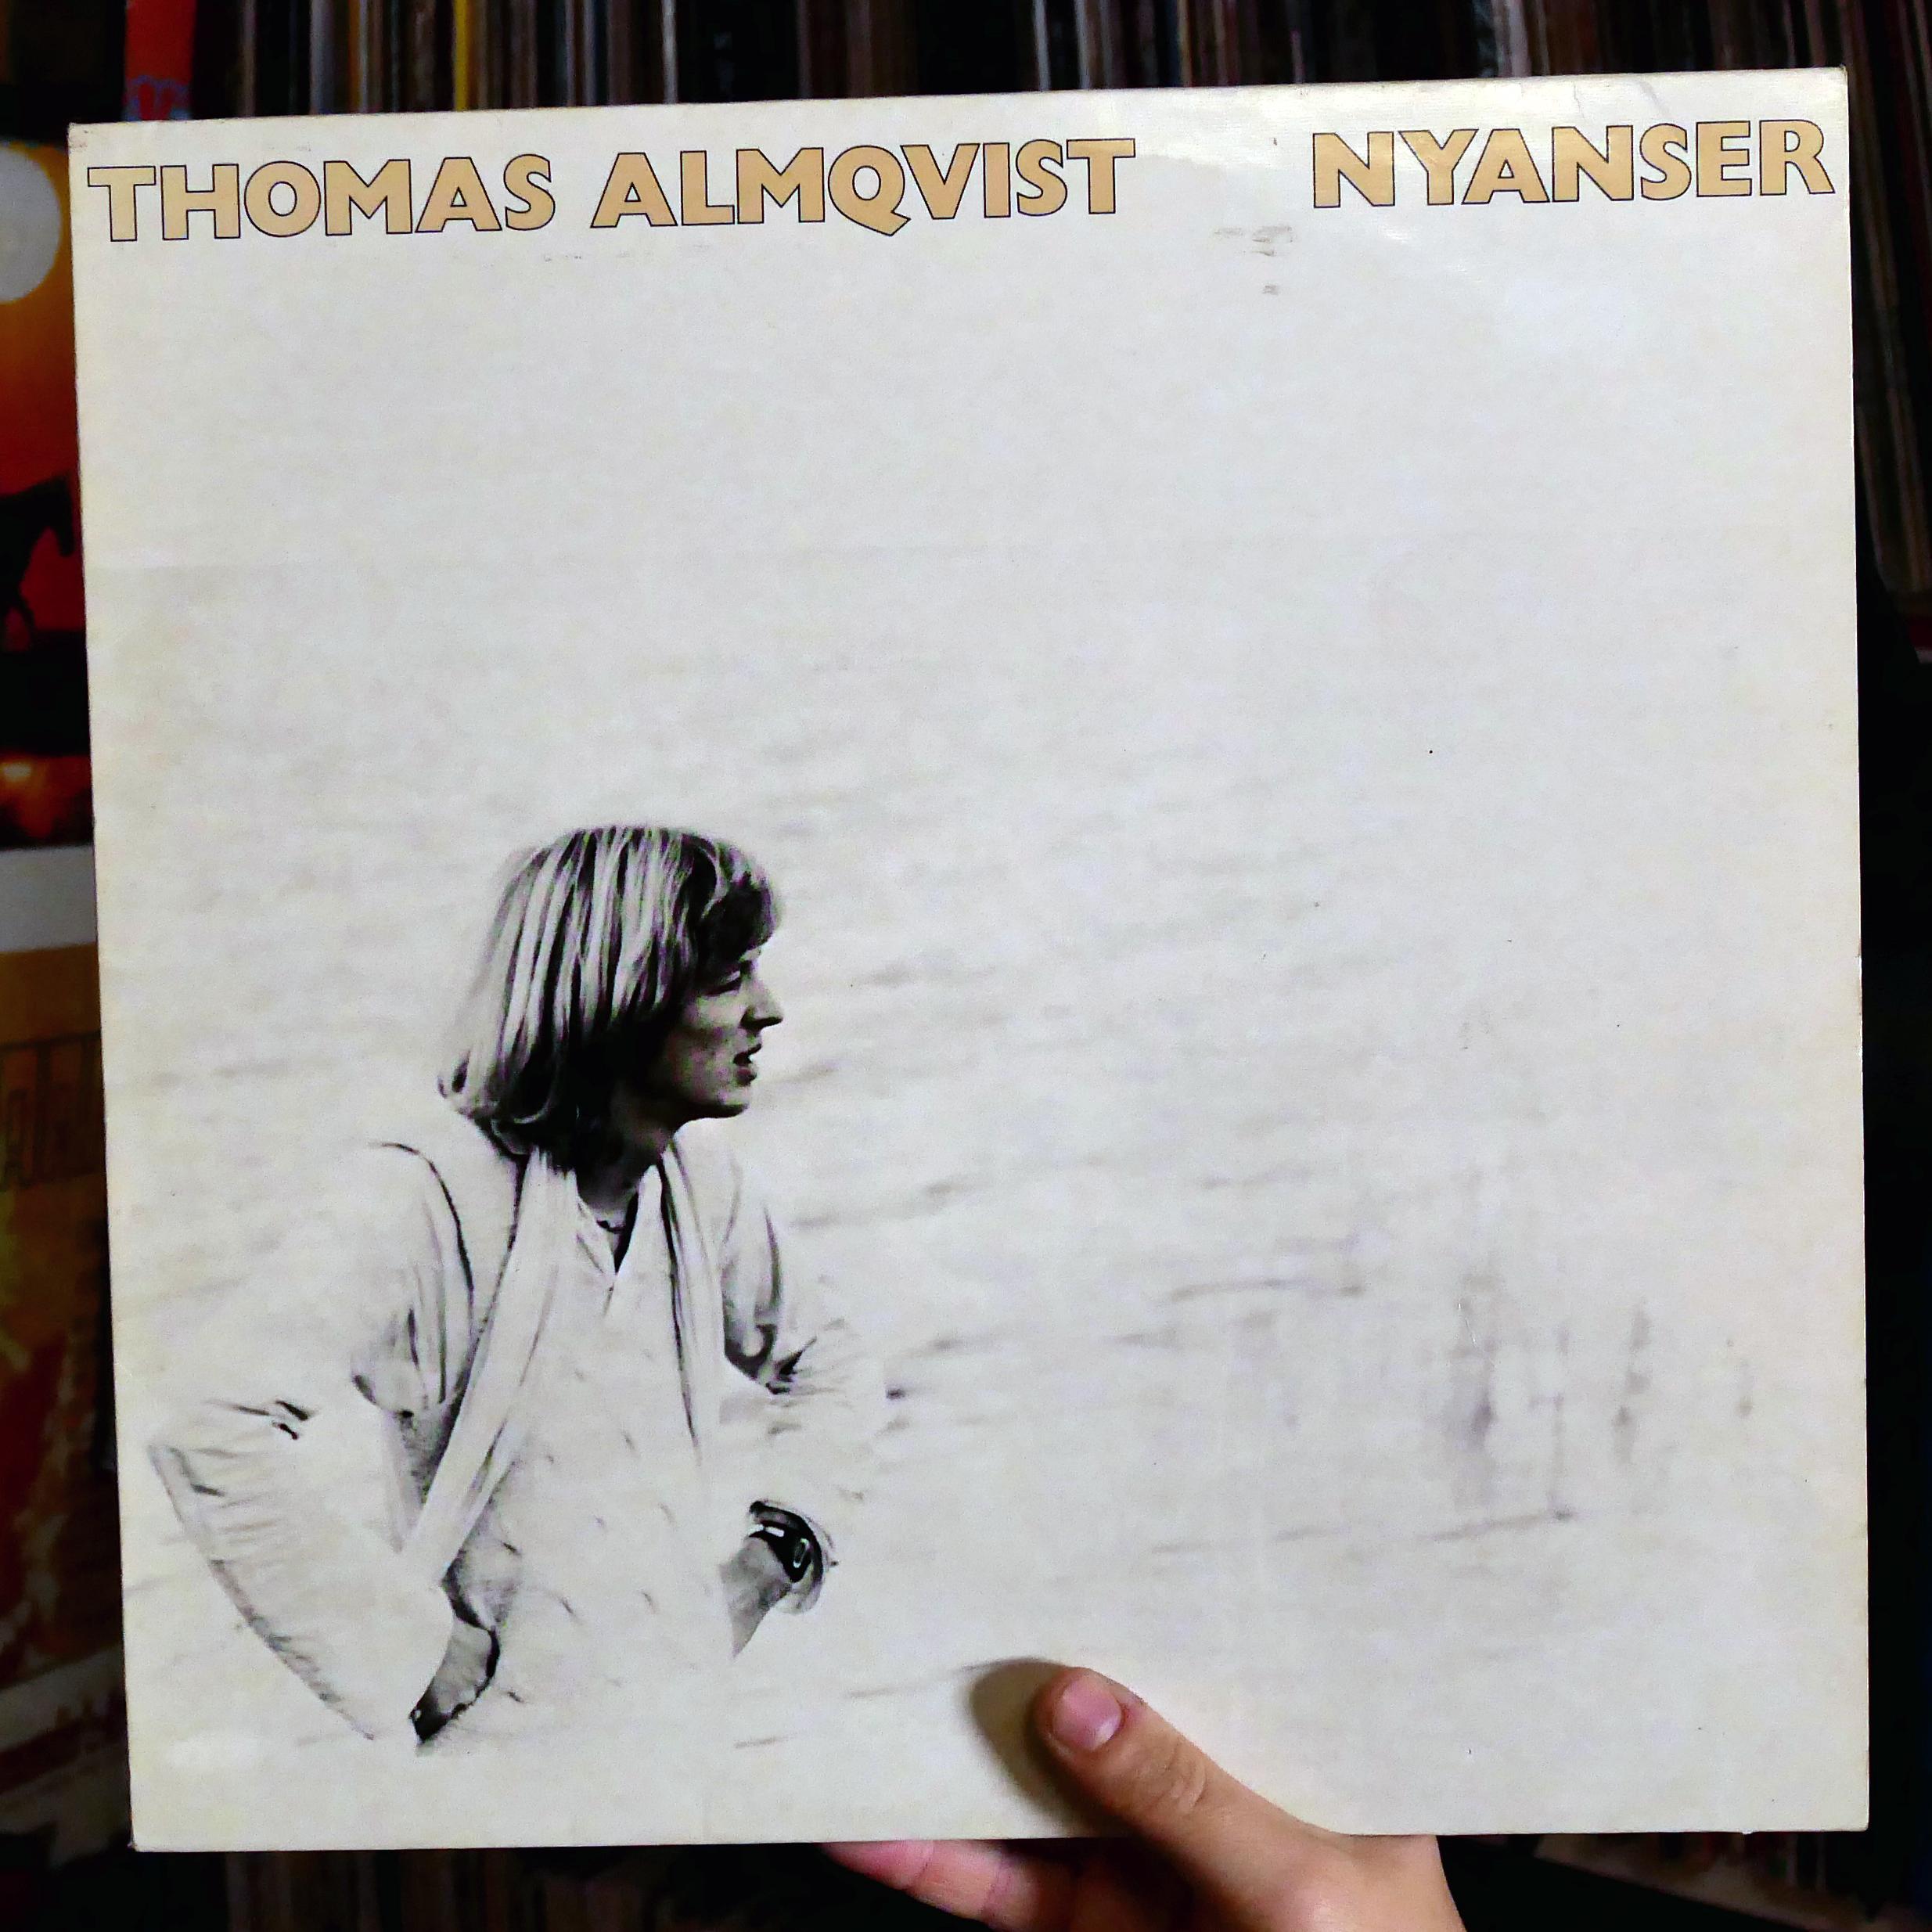 Thomas Almqvist – Nyanser